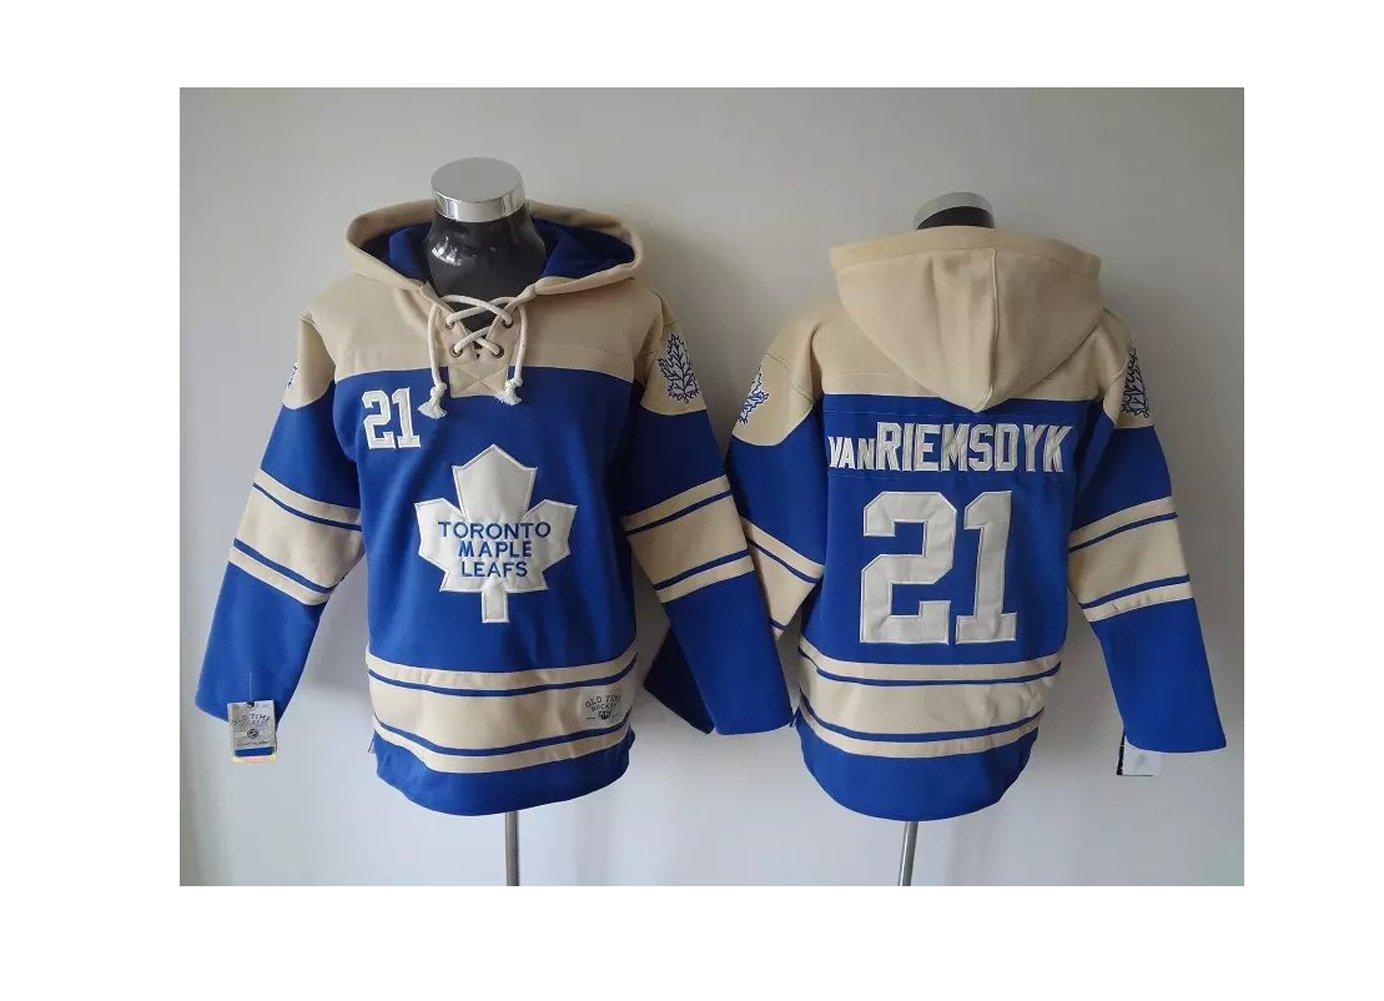 Amazon.com  Toronto Maple Leafs Mascot Men s Beige BLUE  21 Ice Hockey  Hoodies Size XXXL Black (8442856668881)  Books f2b2733a2